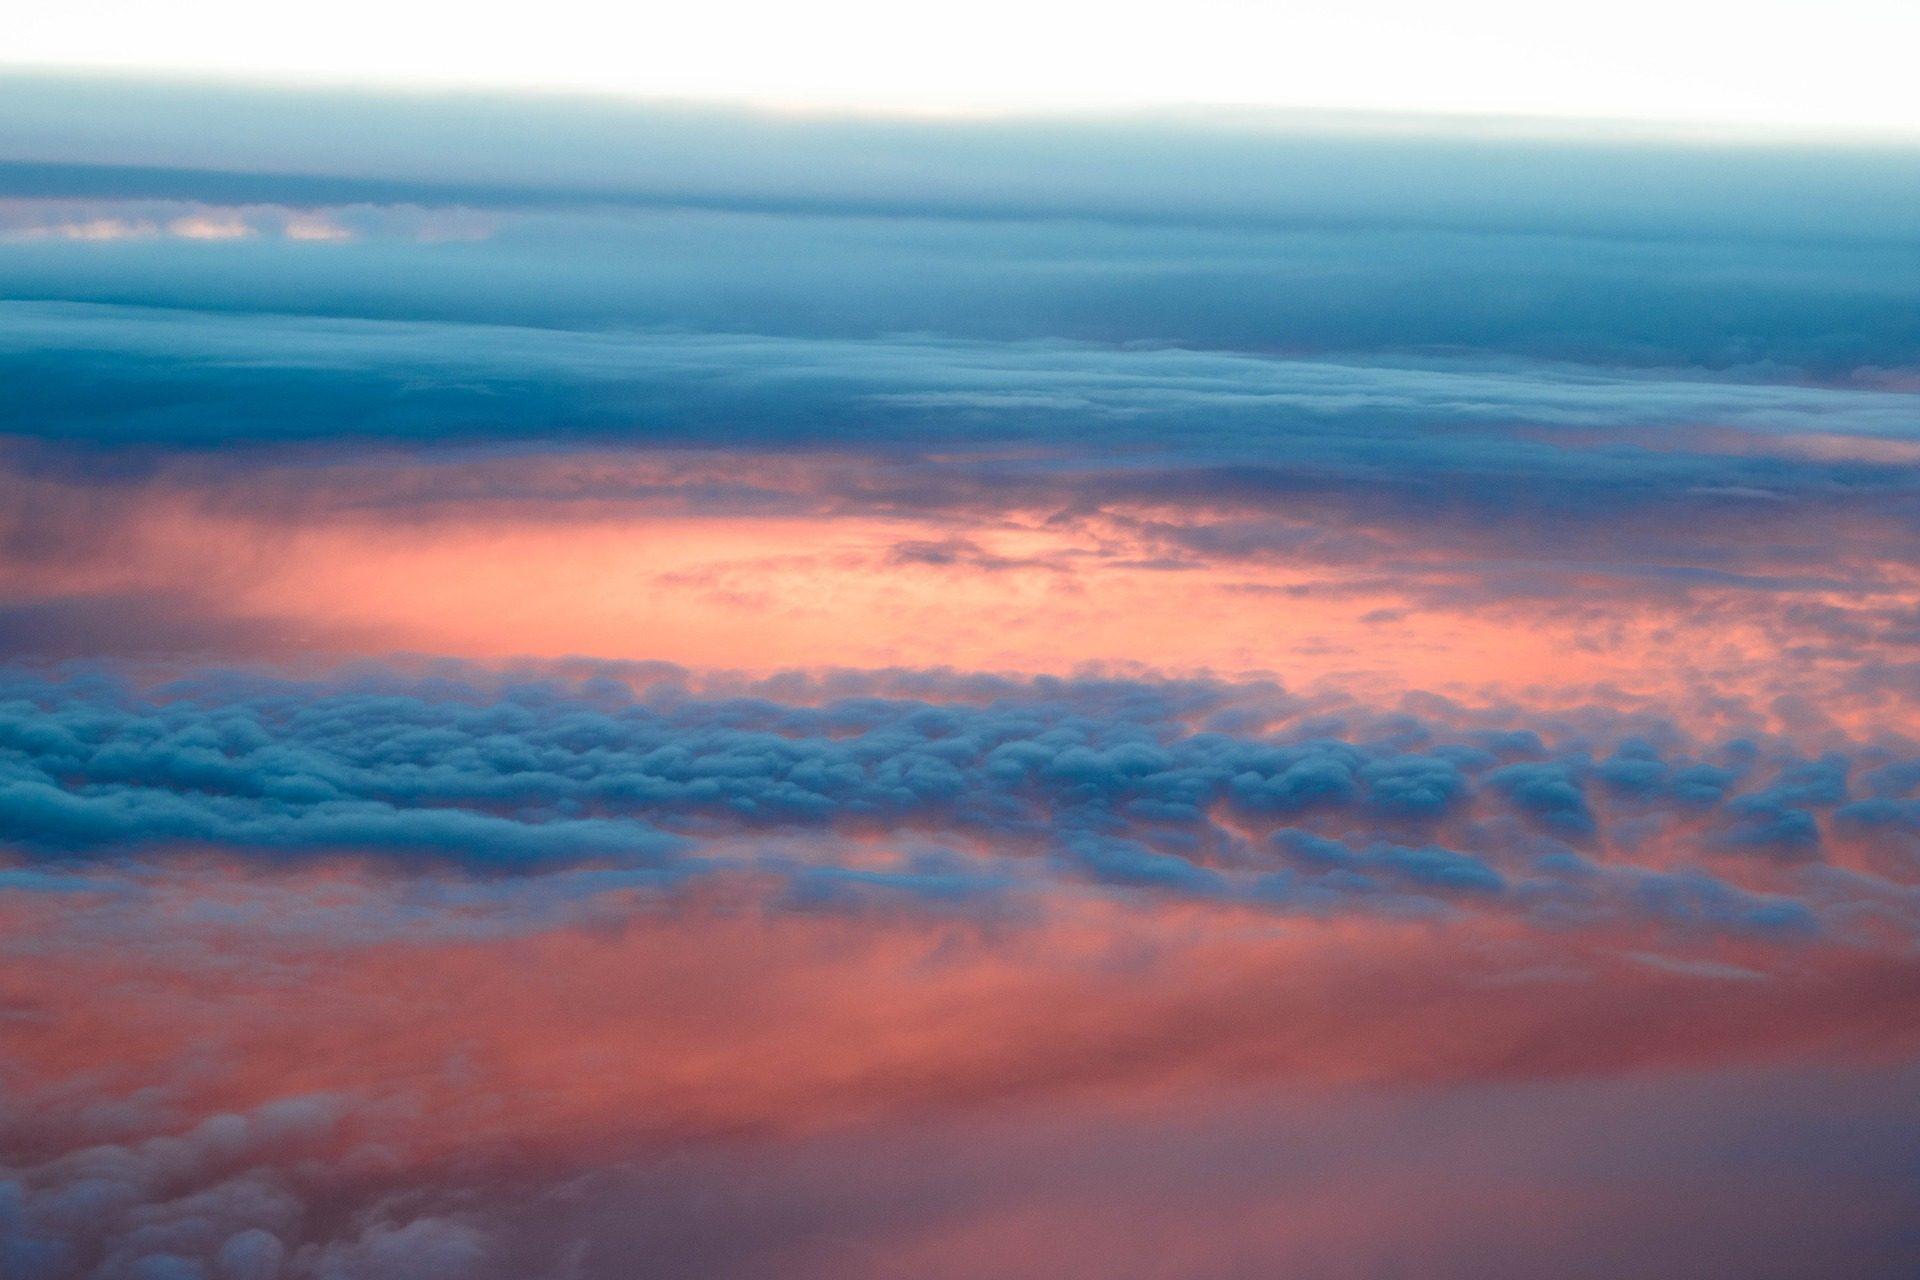 Himmel, Wolken, bewölkt, Cluster, bunte, Sonnenuntergang - Wallpaper HD - Prof.-falken.com